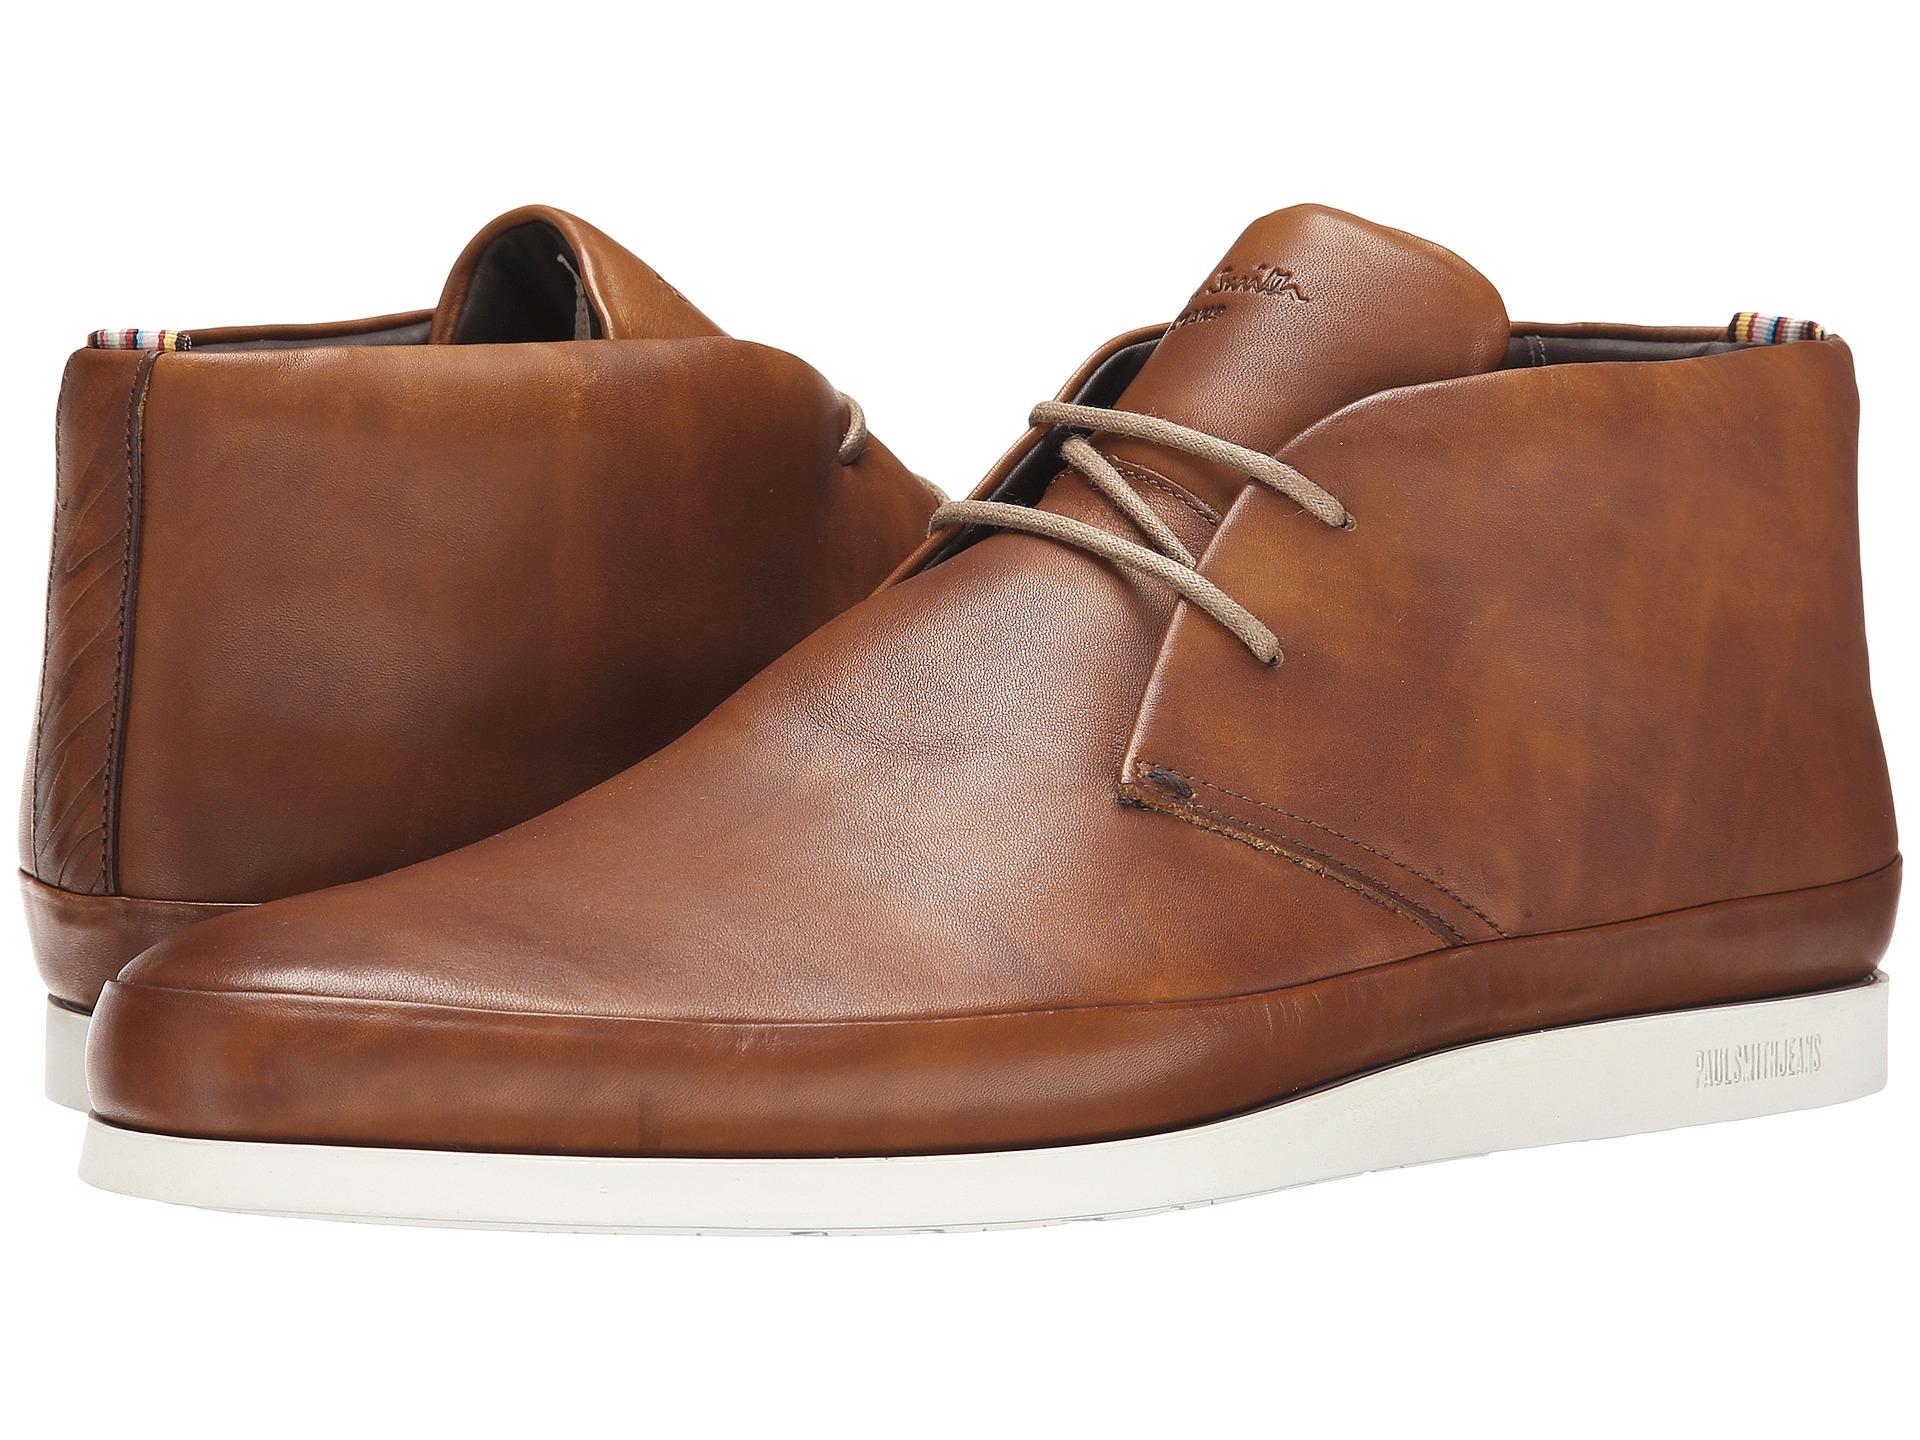 Fong Vulc Chukka Brown Desert Boots By Paul Smith rbioNMUX